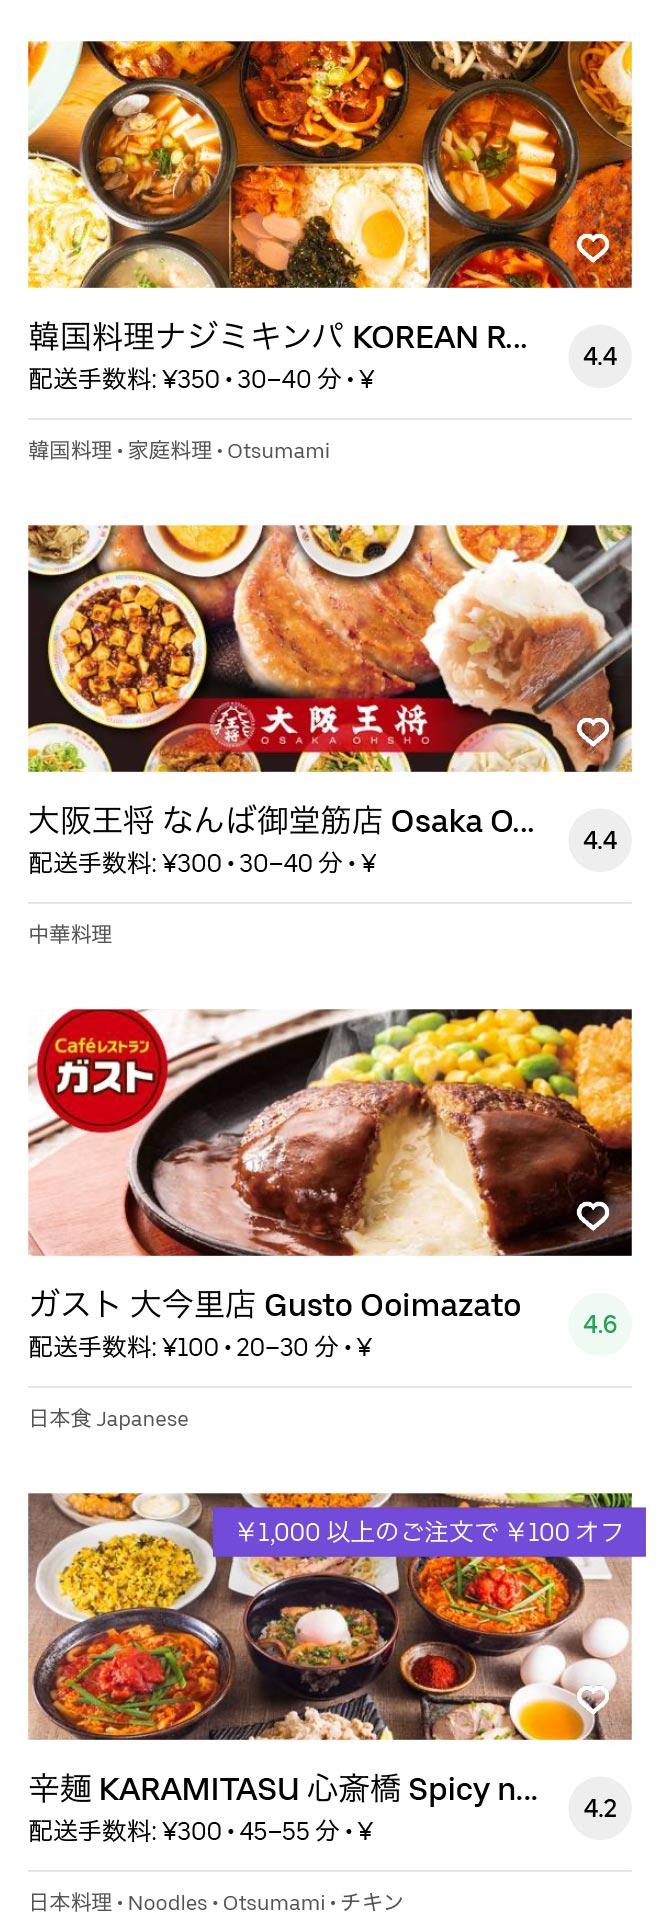 Osaka imazato menu 2005 09